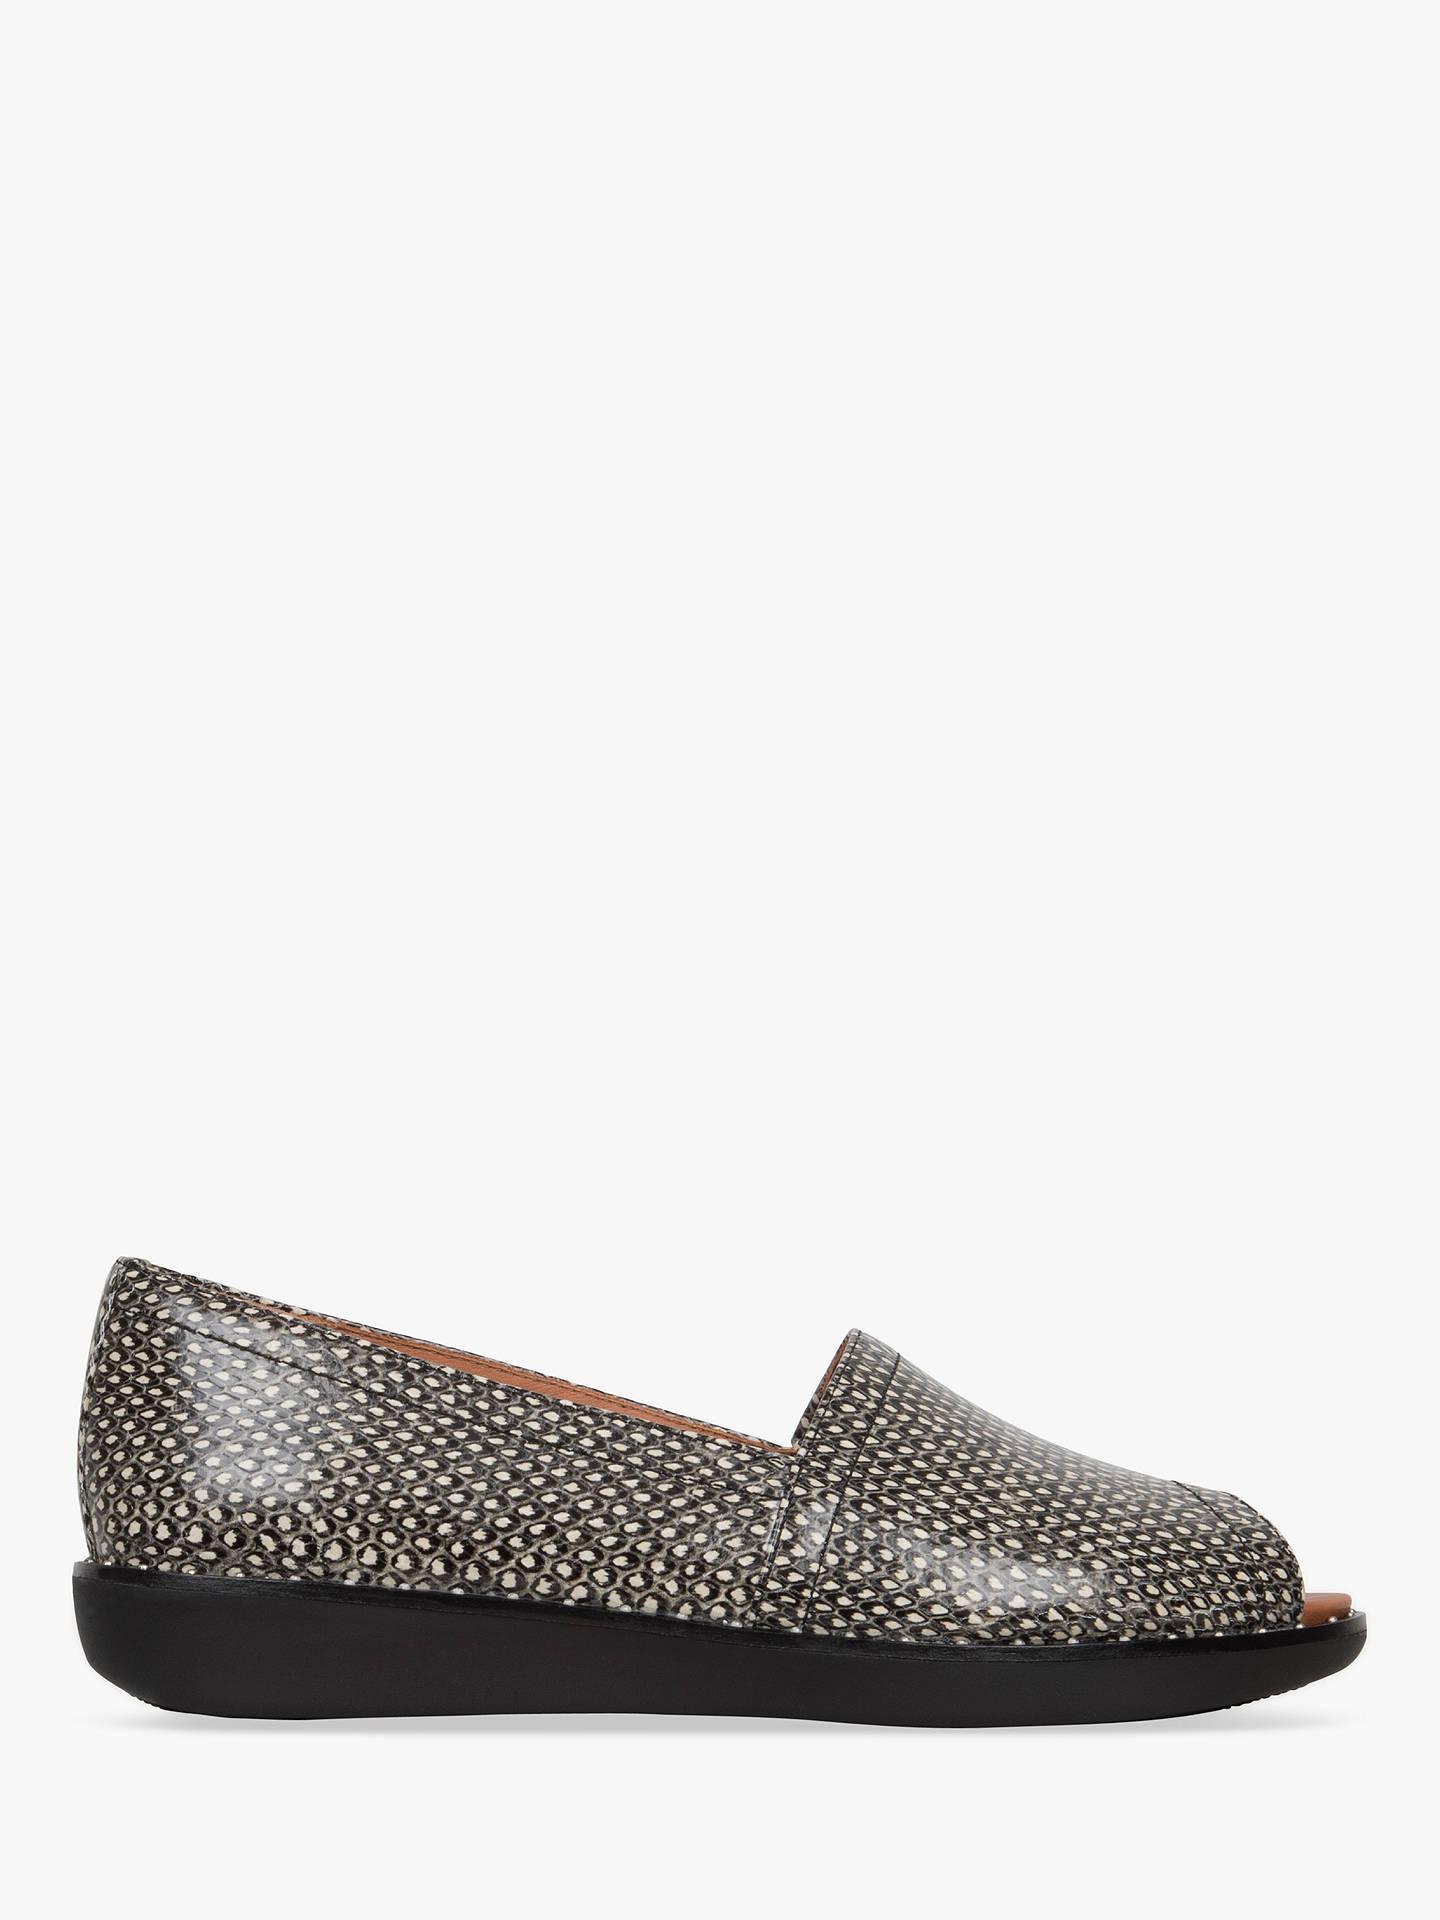 74e189528489e Buy FitFlop Nadia Peep Toe Loafers